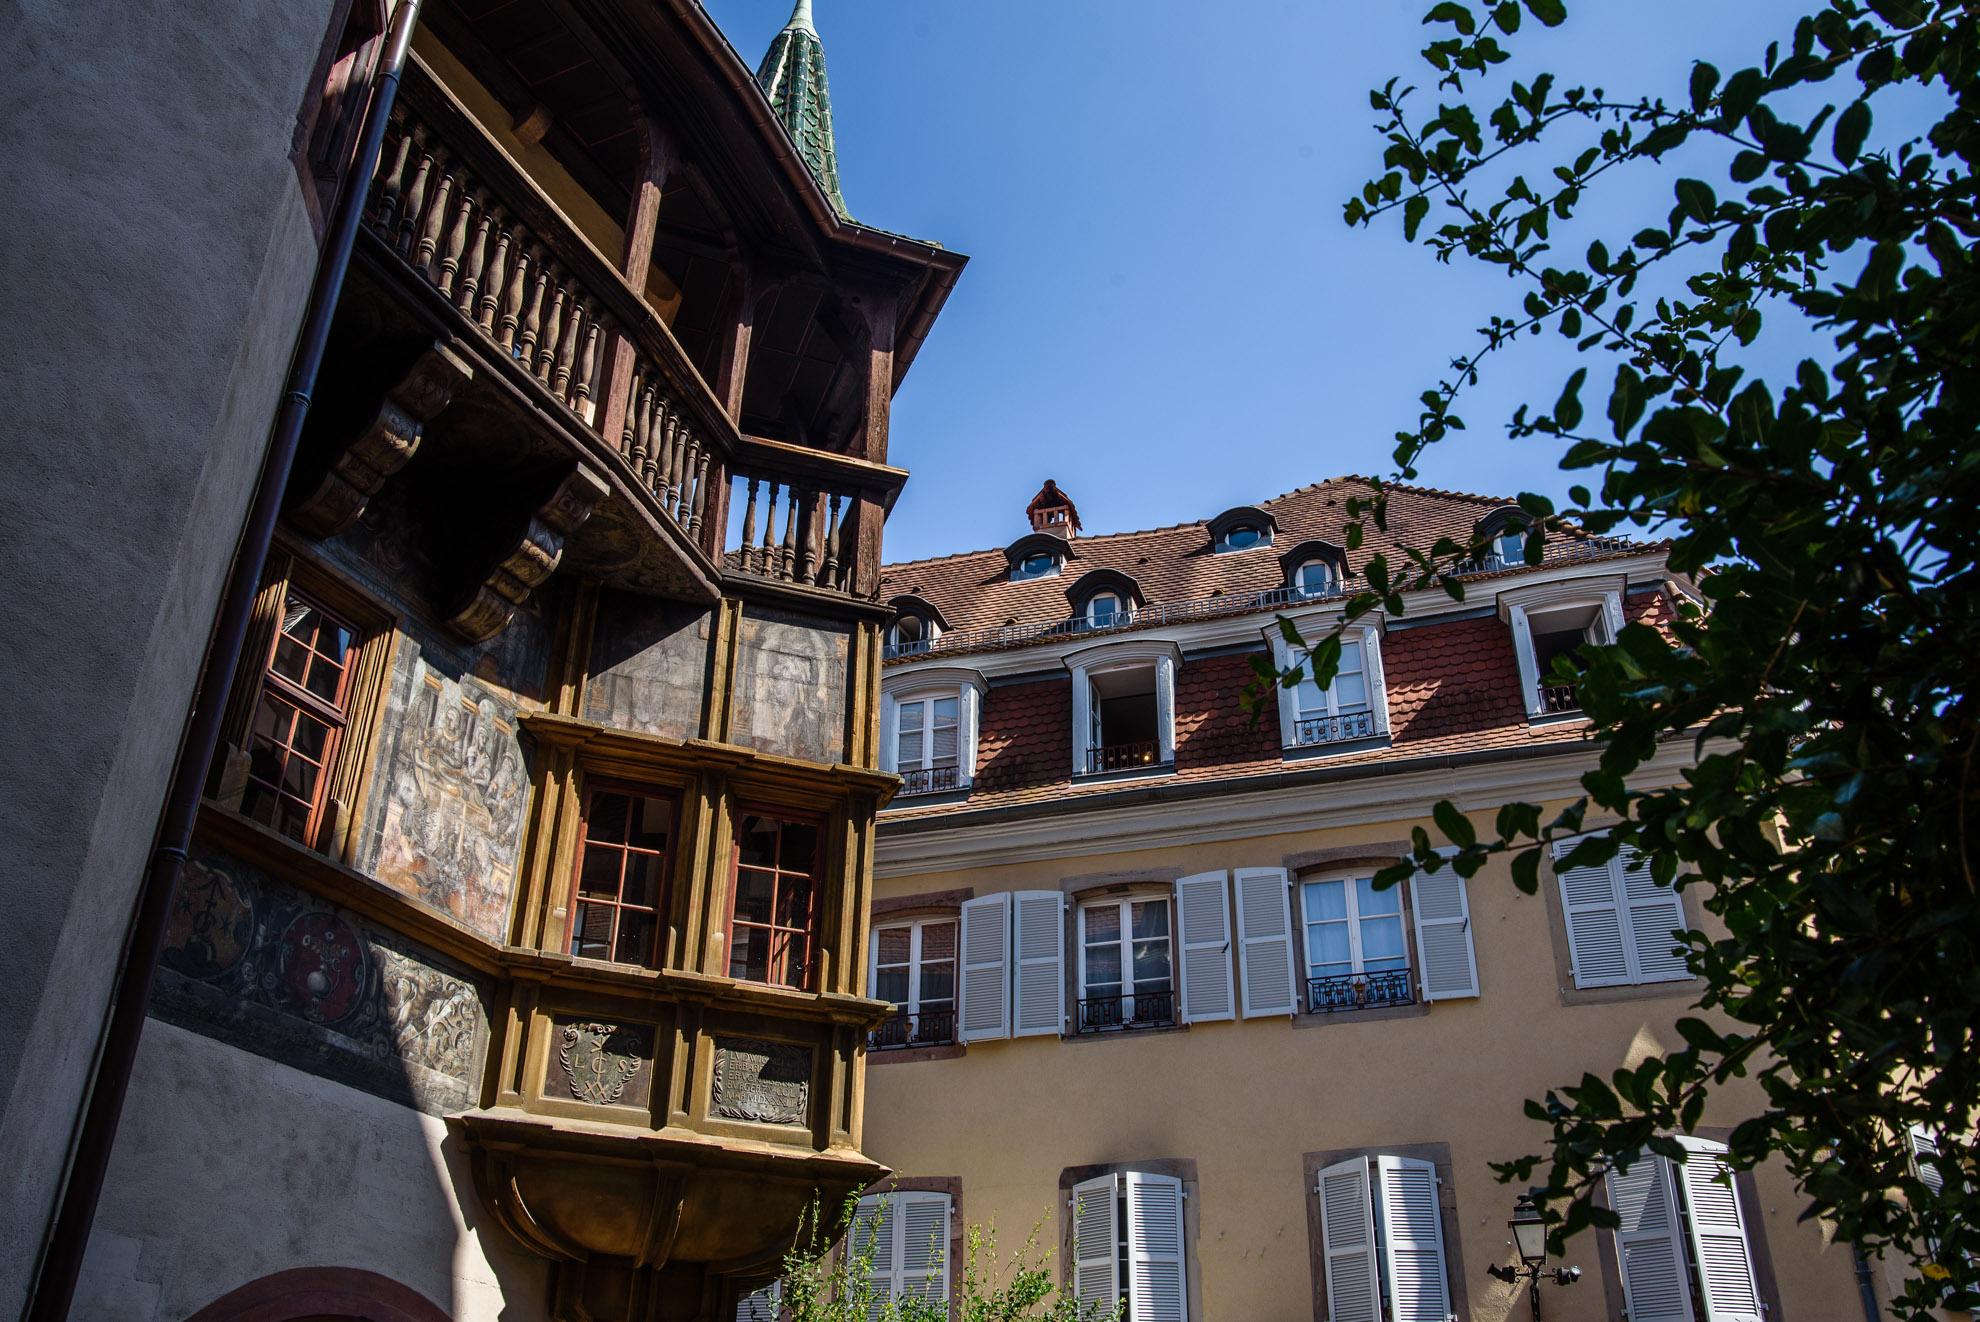 Maison Pfister w Colmarze